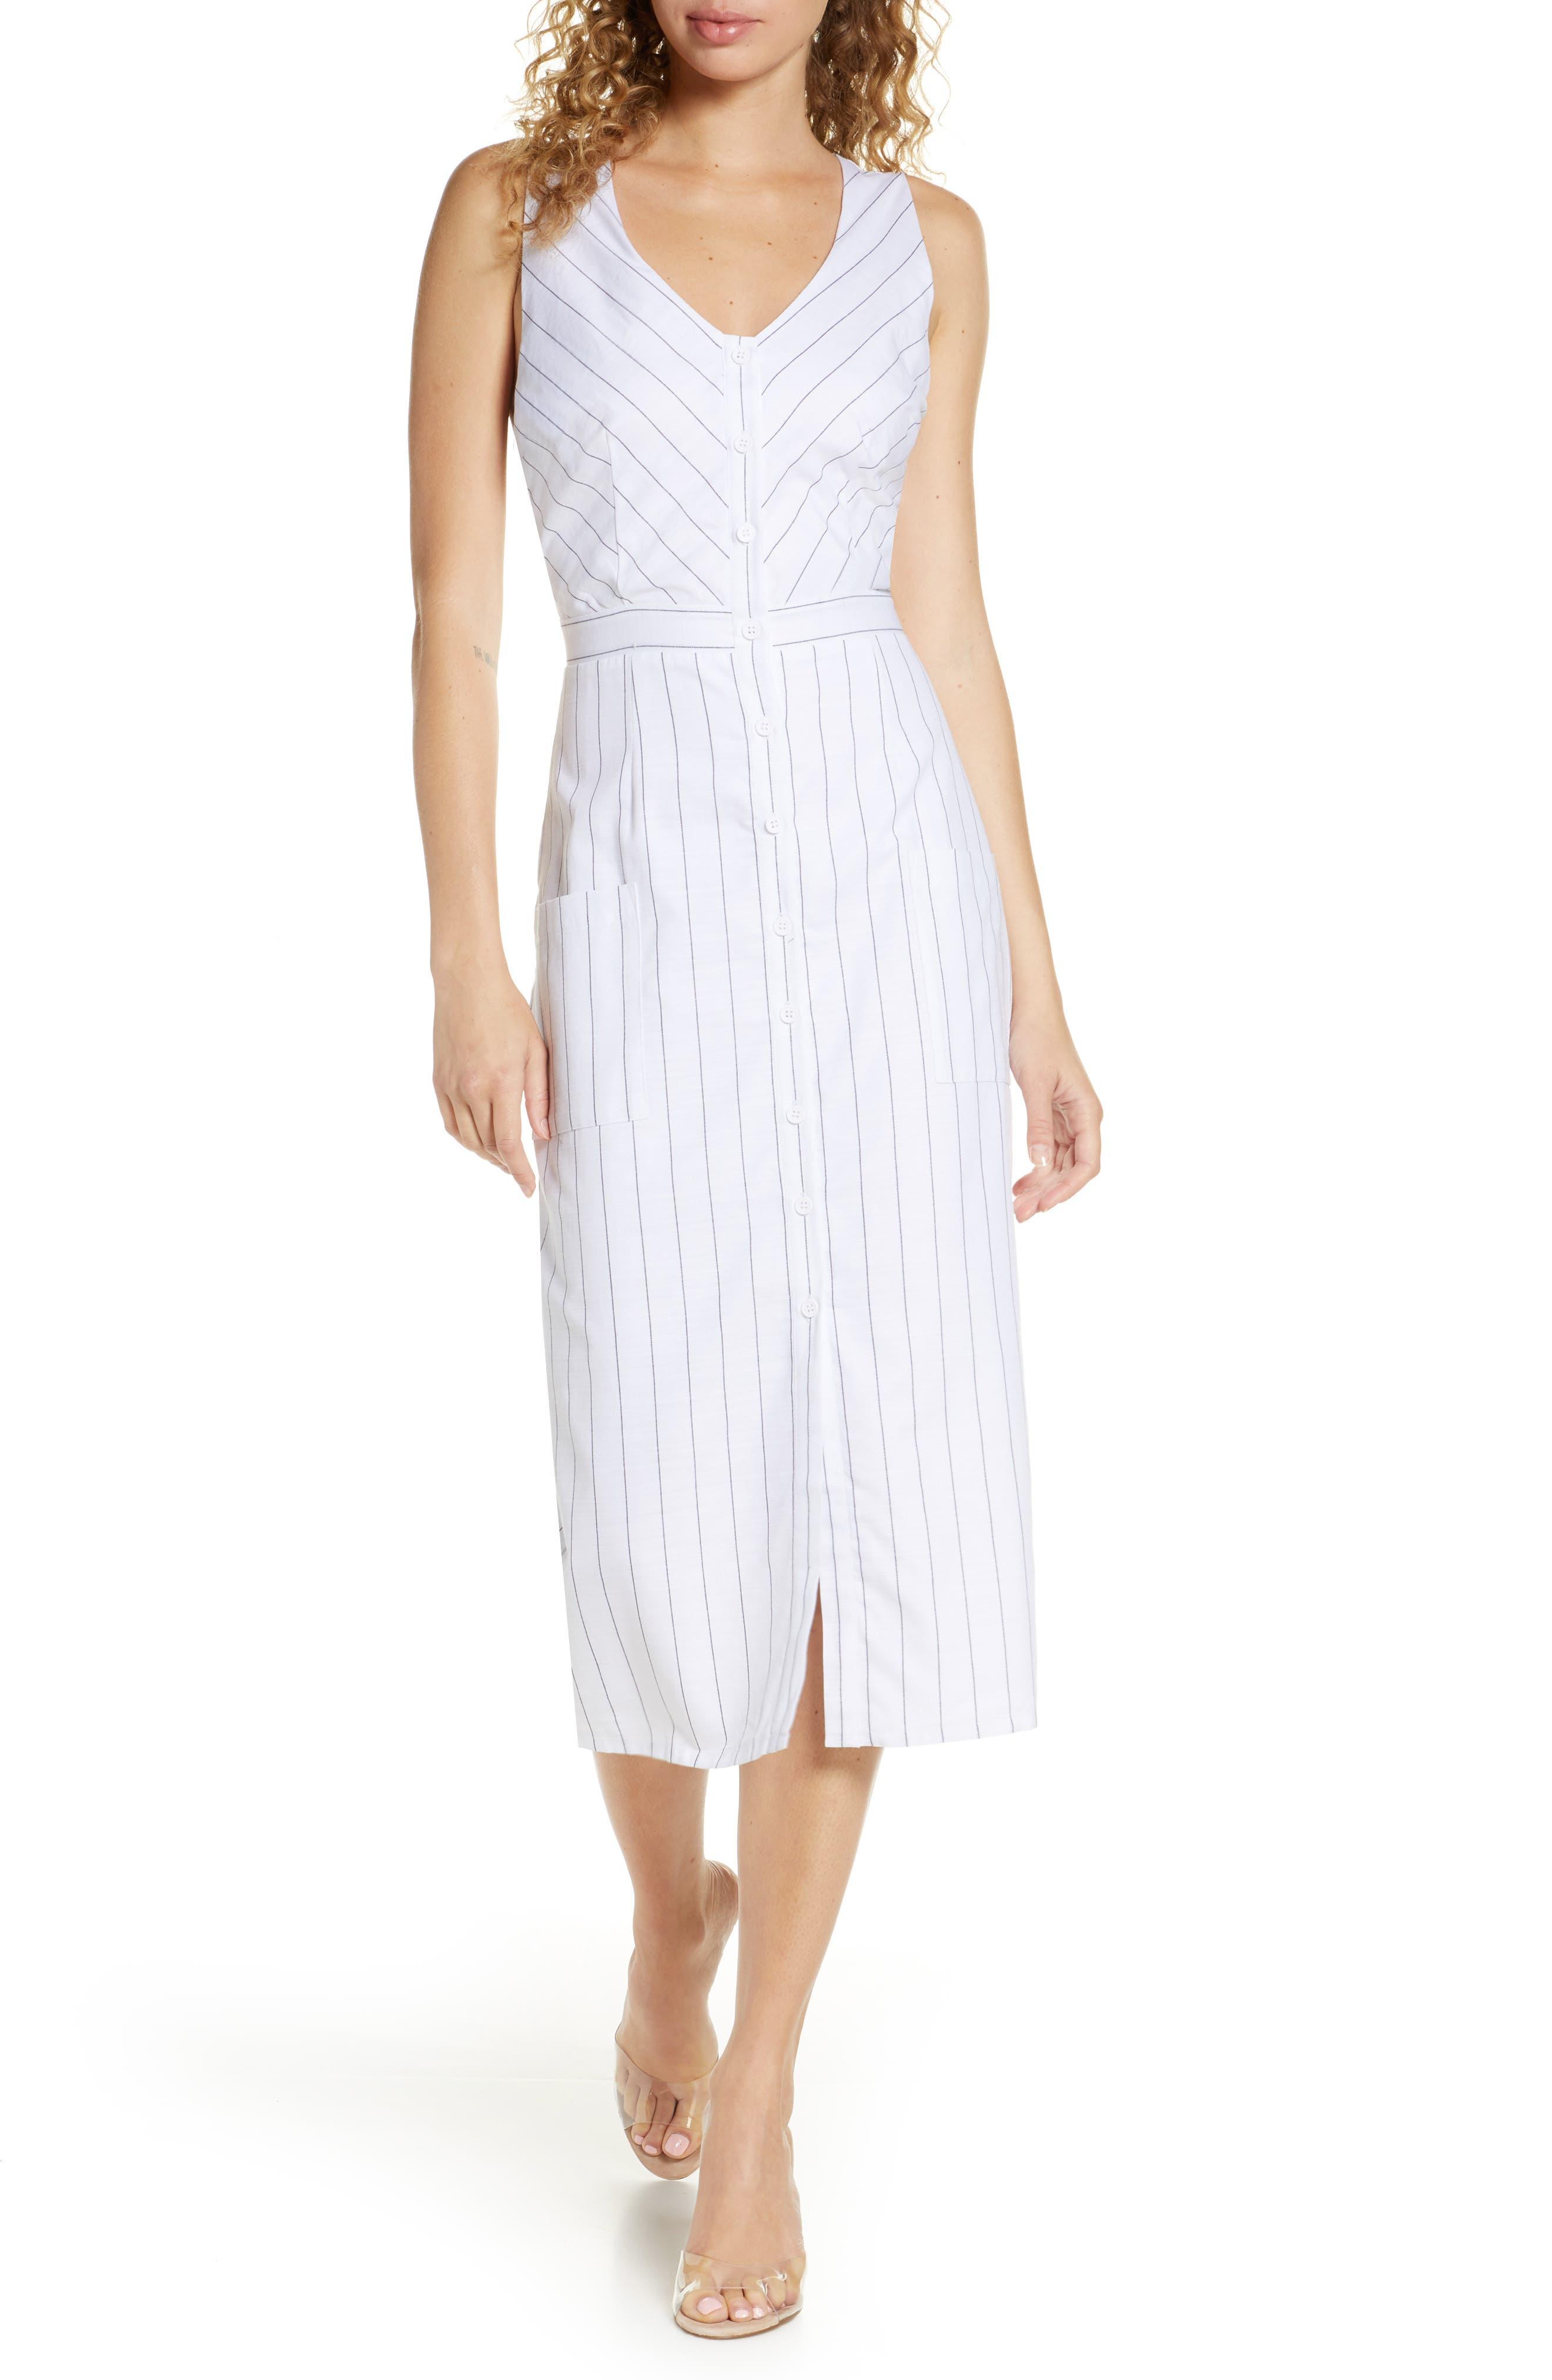 Bb Dakota In The Swing Cotton Sheath Dress, White